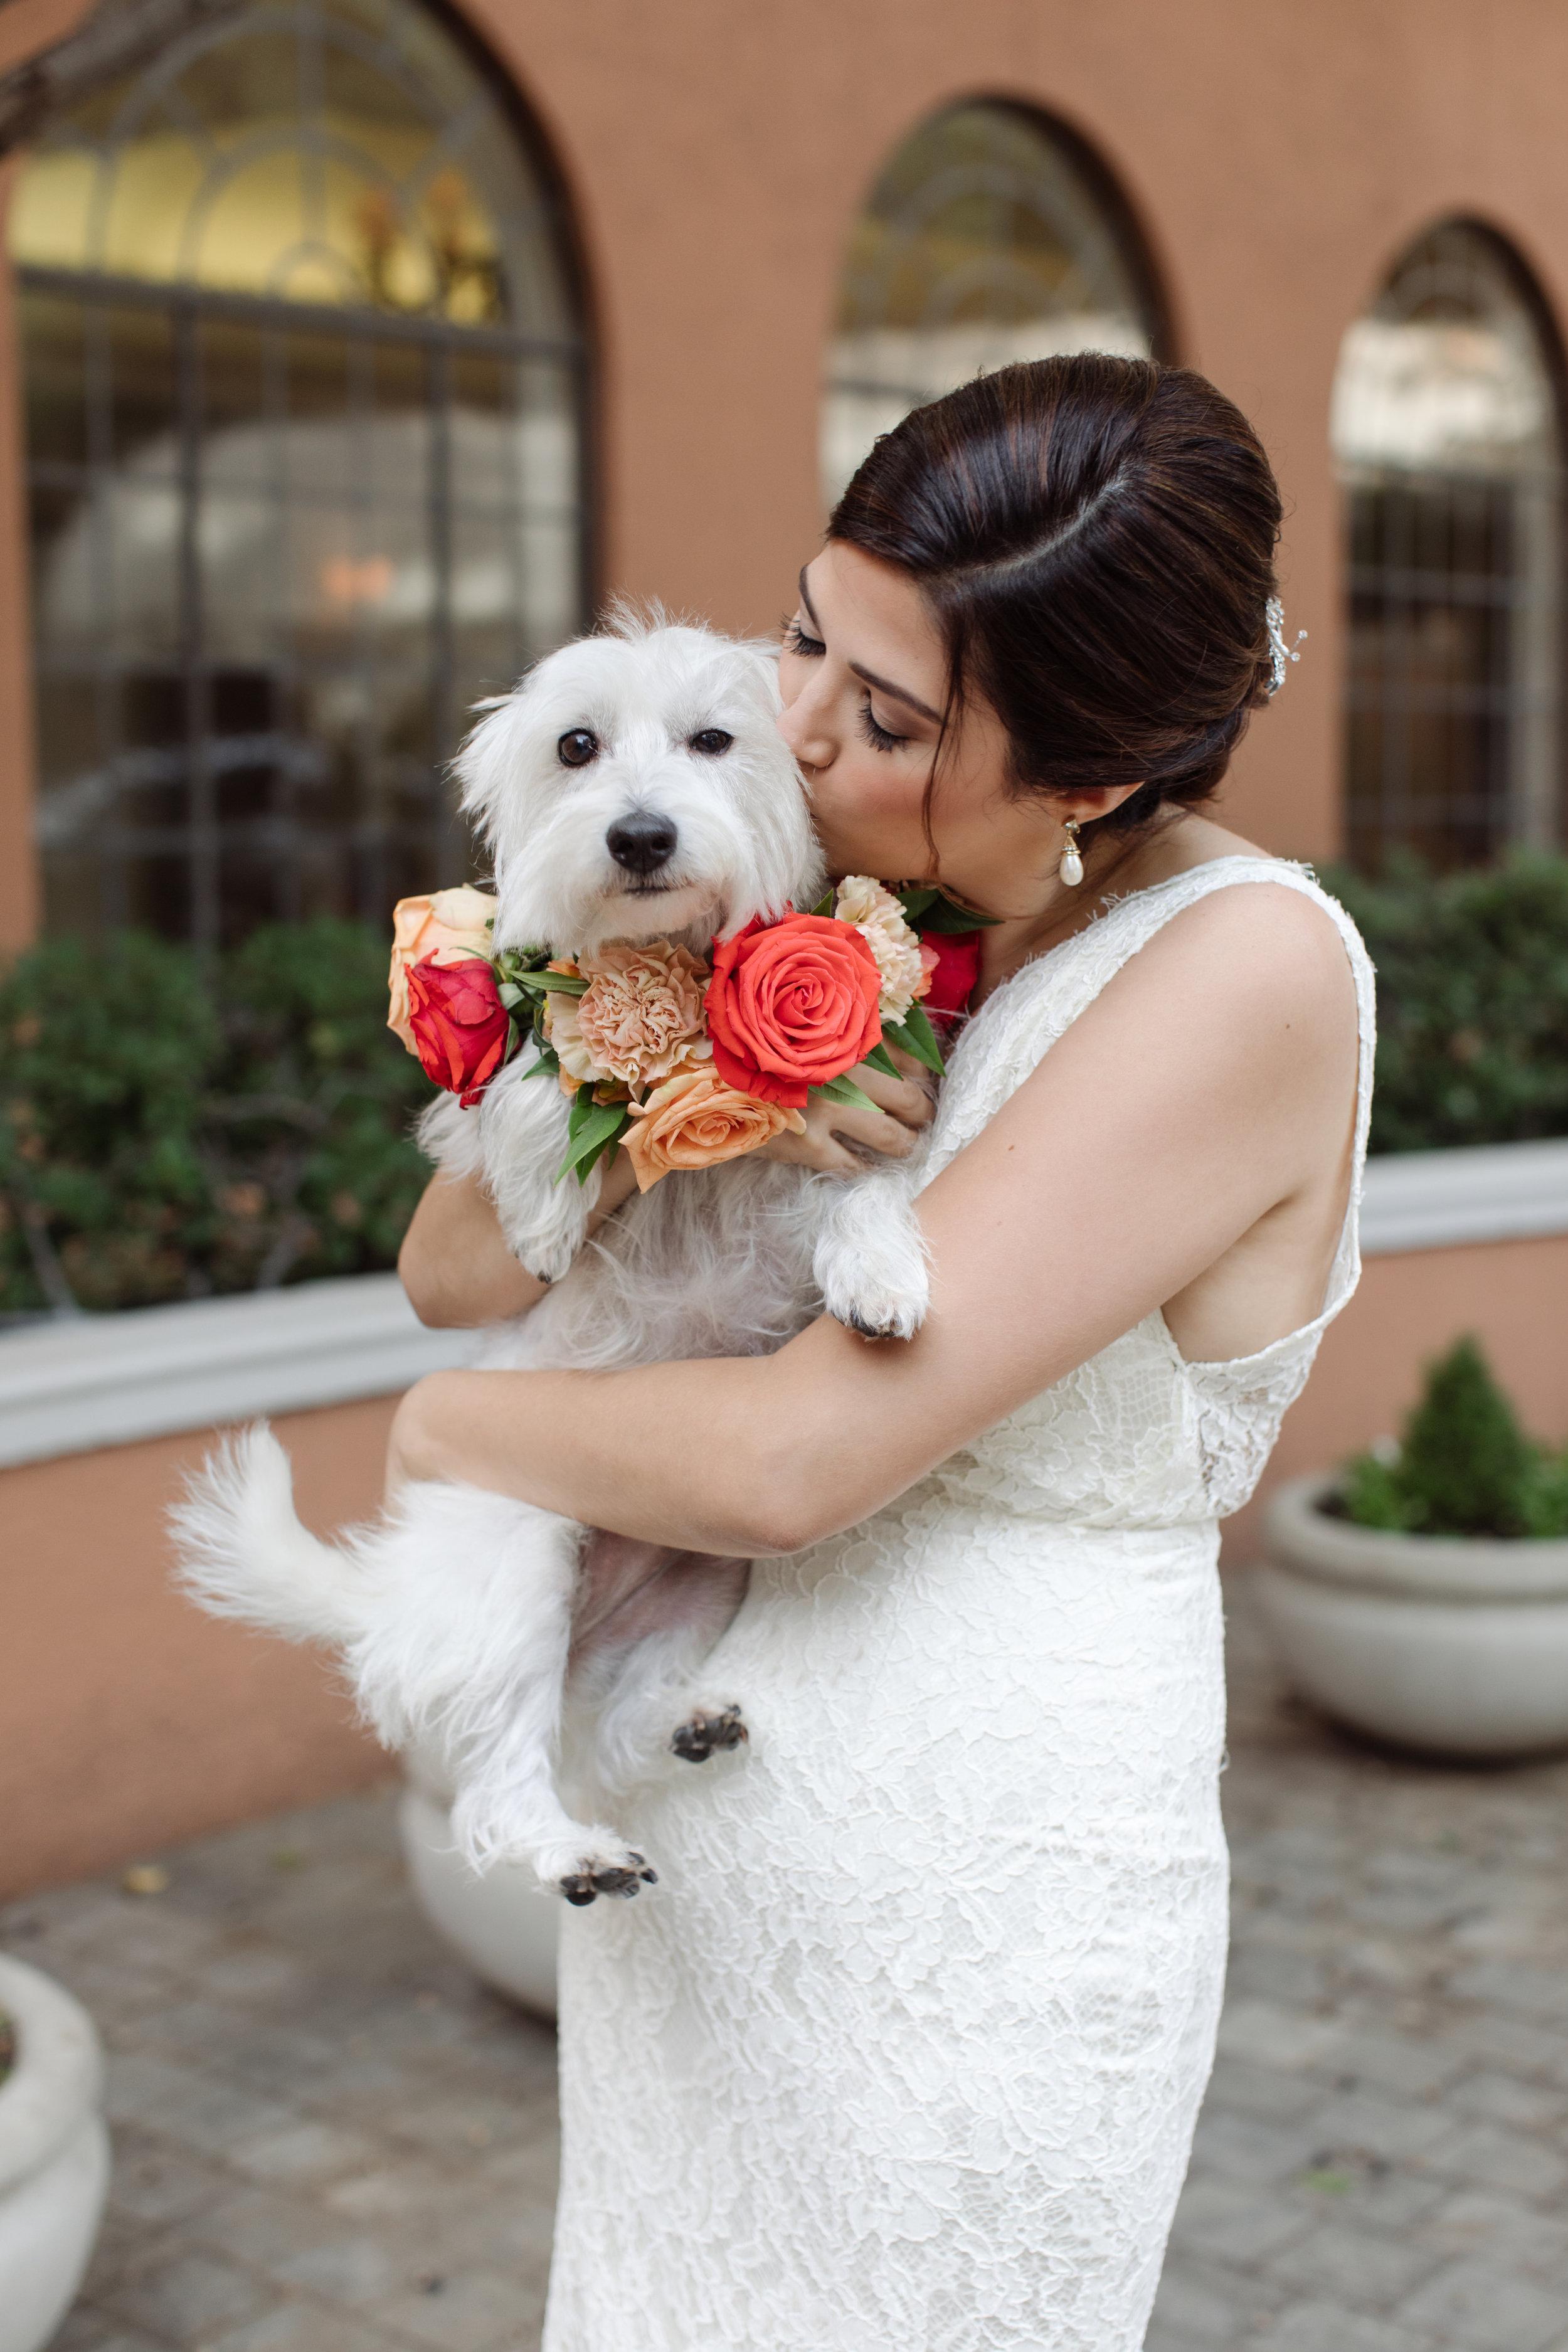 Fur love Details - Dallas, Tx - Fall Wedding - Julian Leaver Events